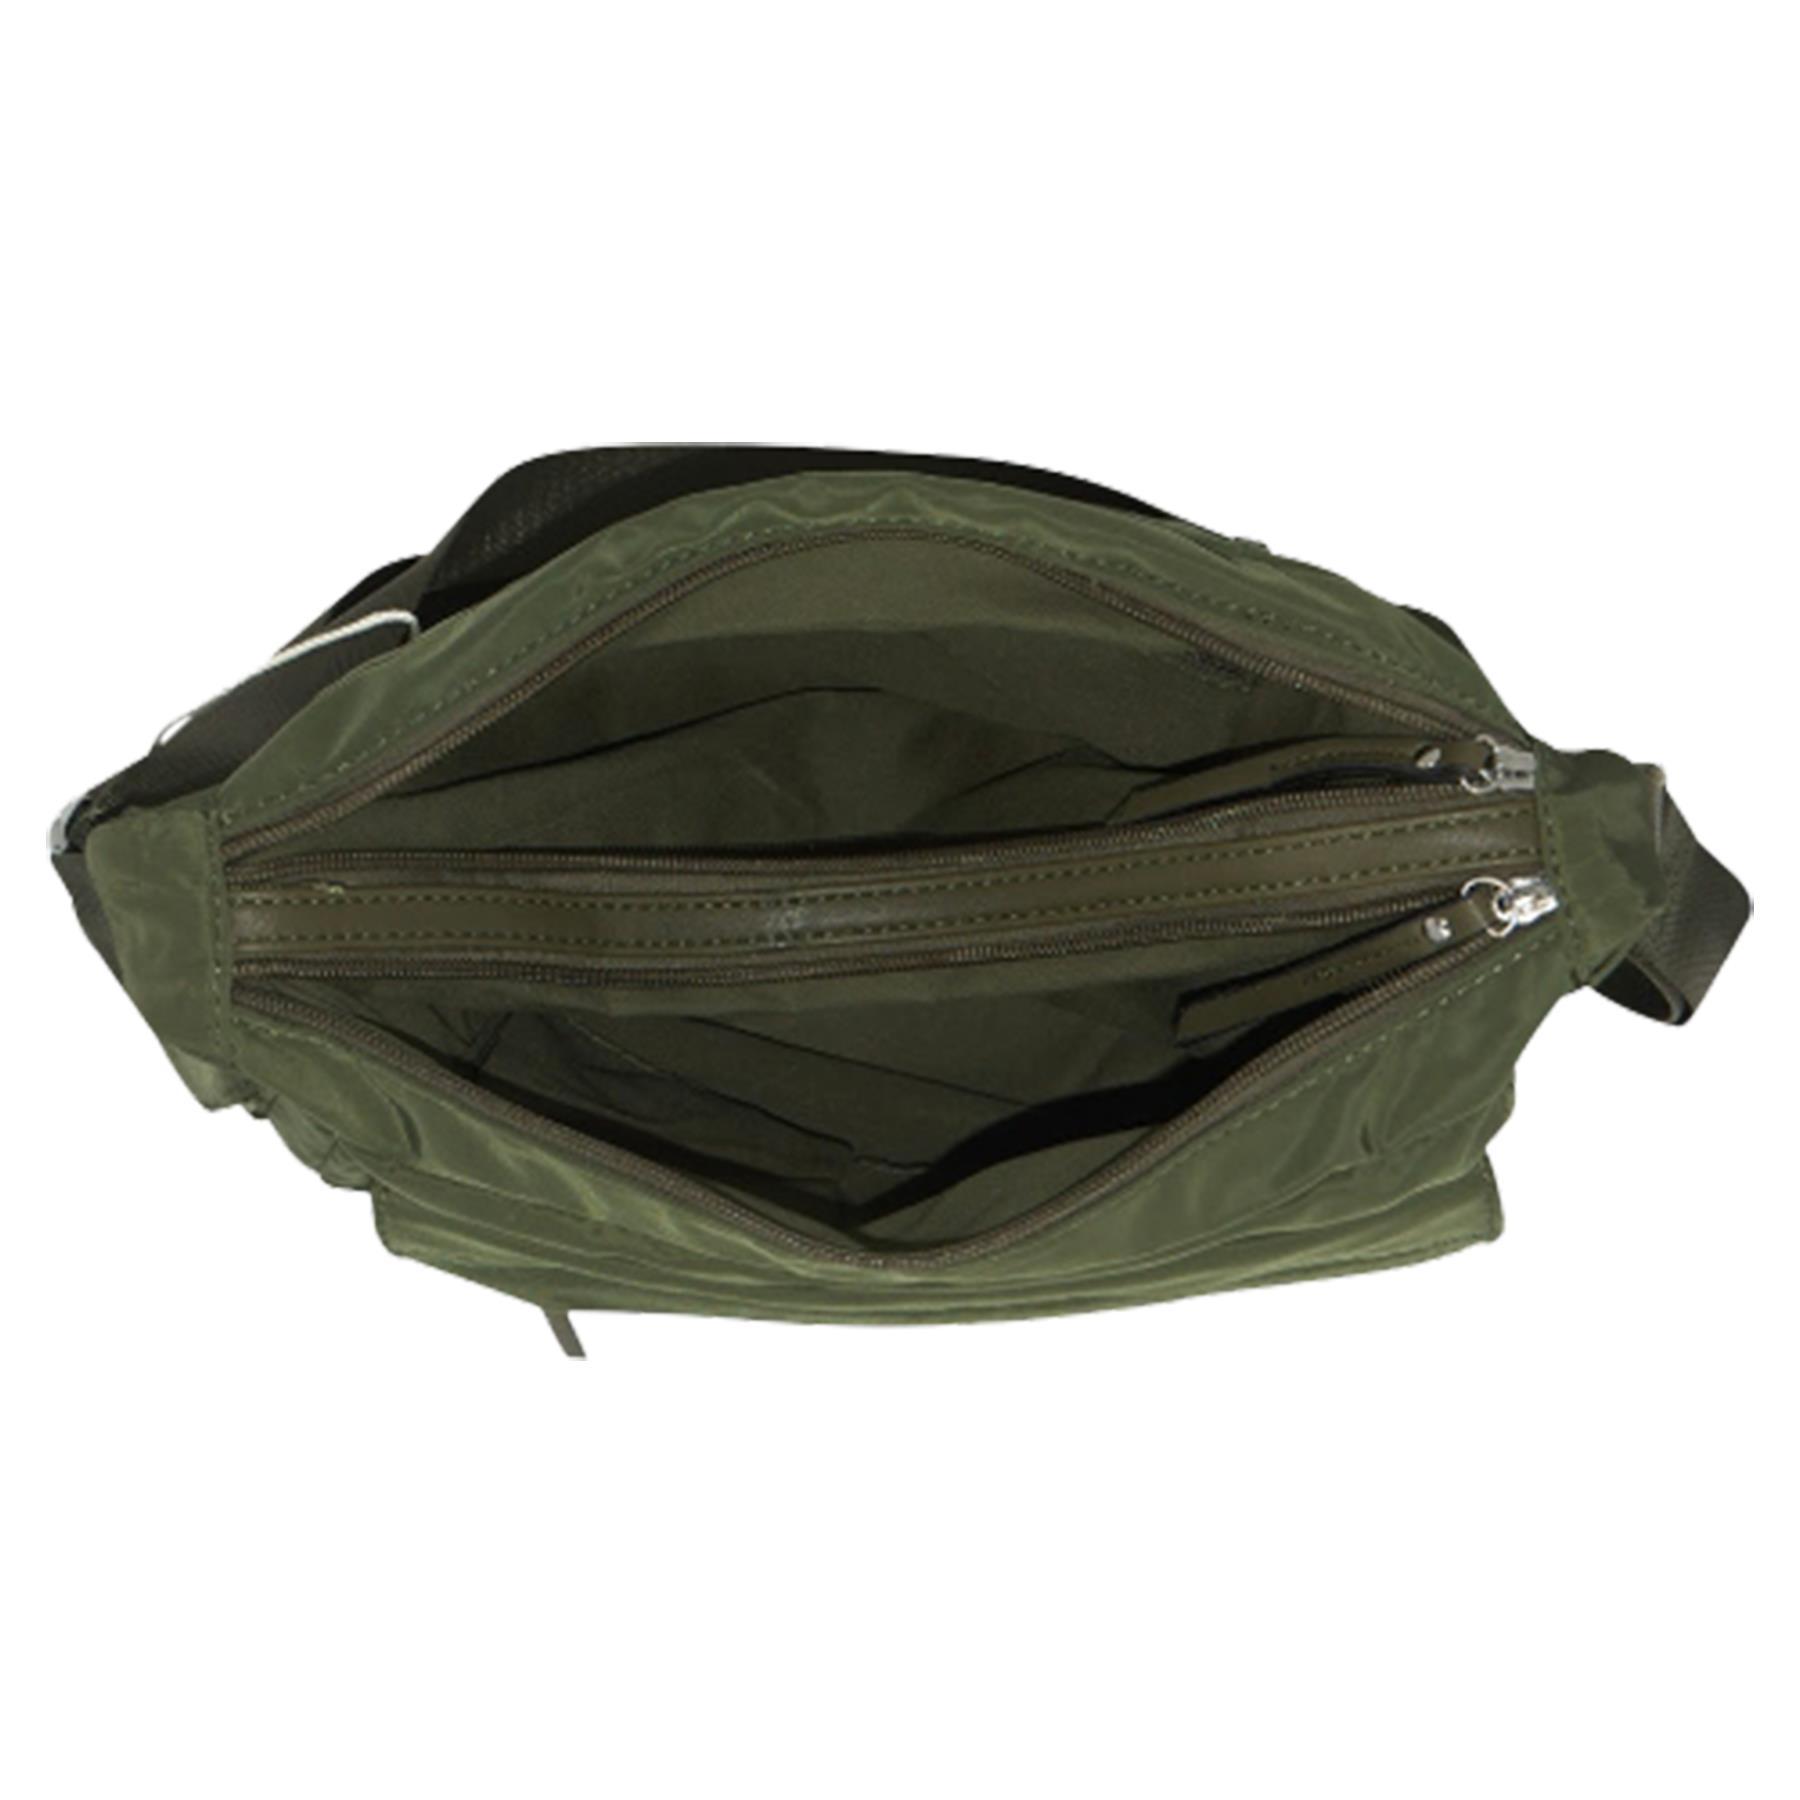 New-Ladies-Men-s-Showerproof-School-College-Practical-Basic-Crossbody-Bag thumbnail 22